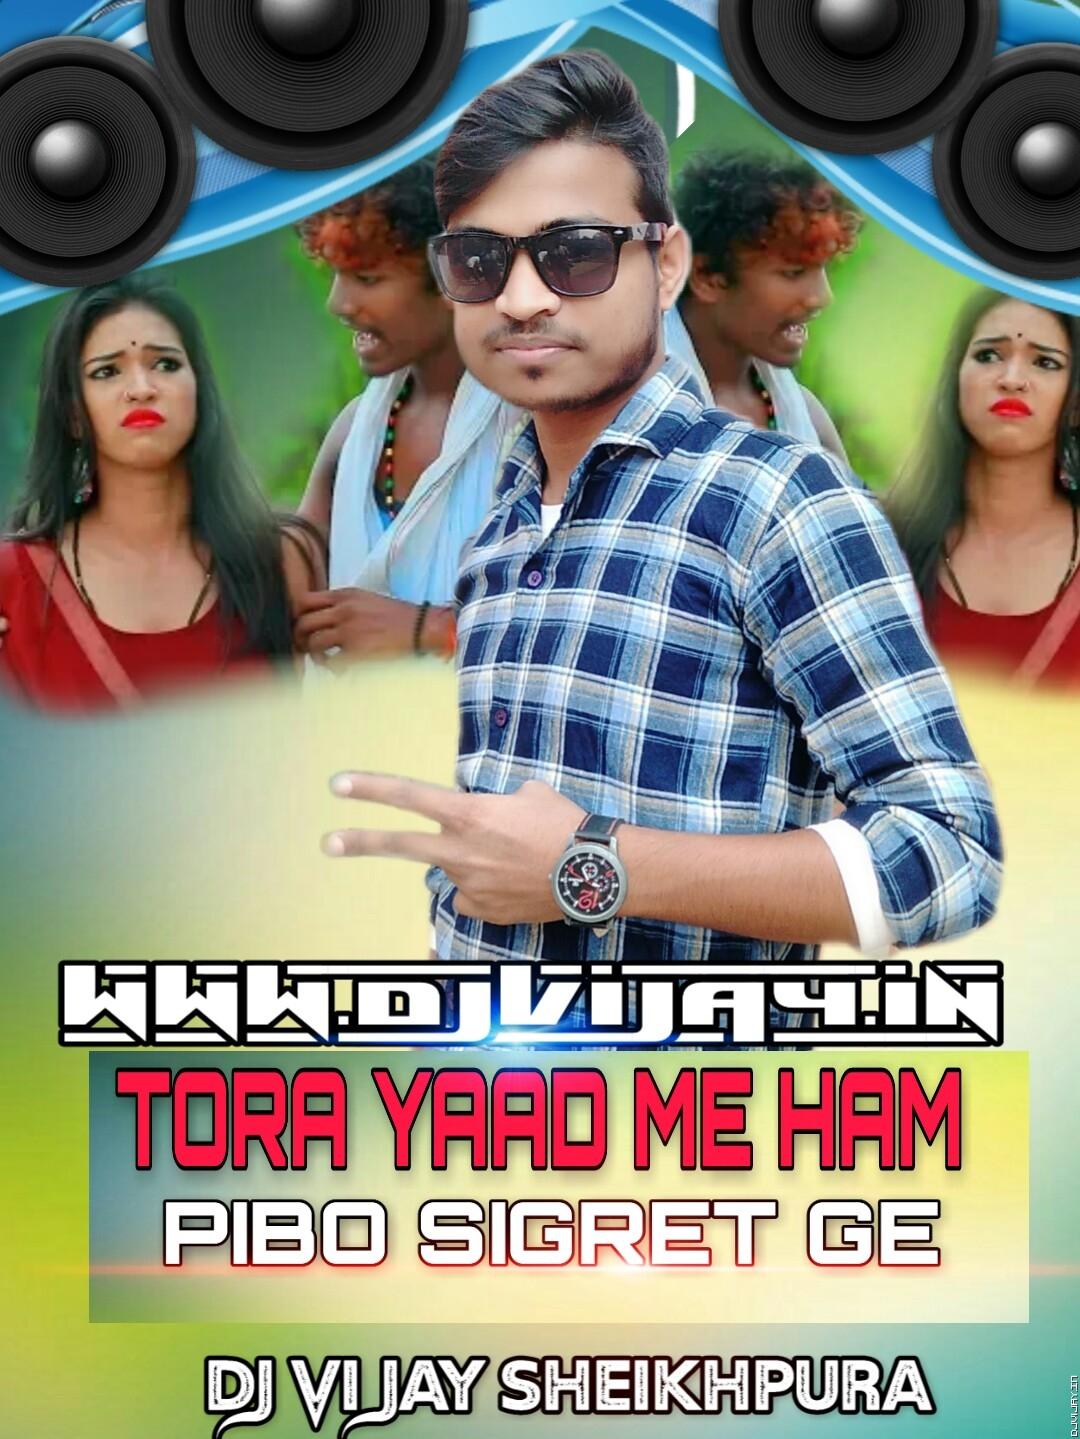 Tor_Yaad_Me_Hum_Pibo_Sigret_Ge_Matal_Dance_Mix_By_Dj_vijay babu.mp3